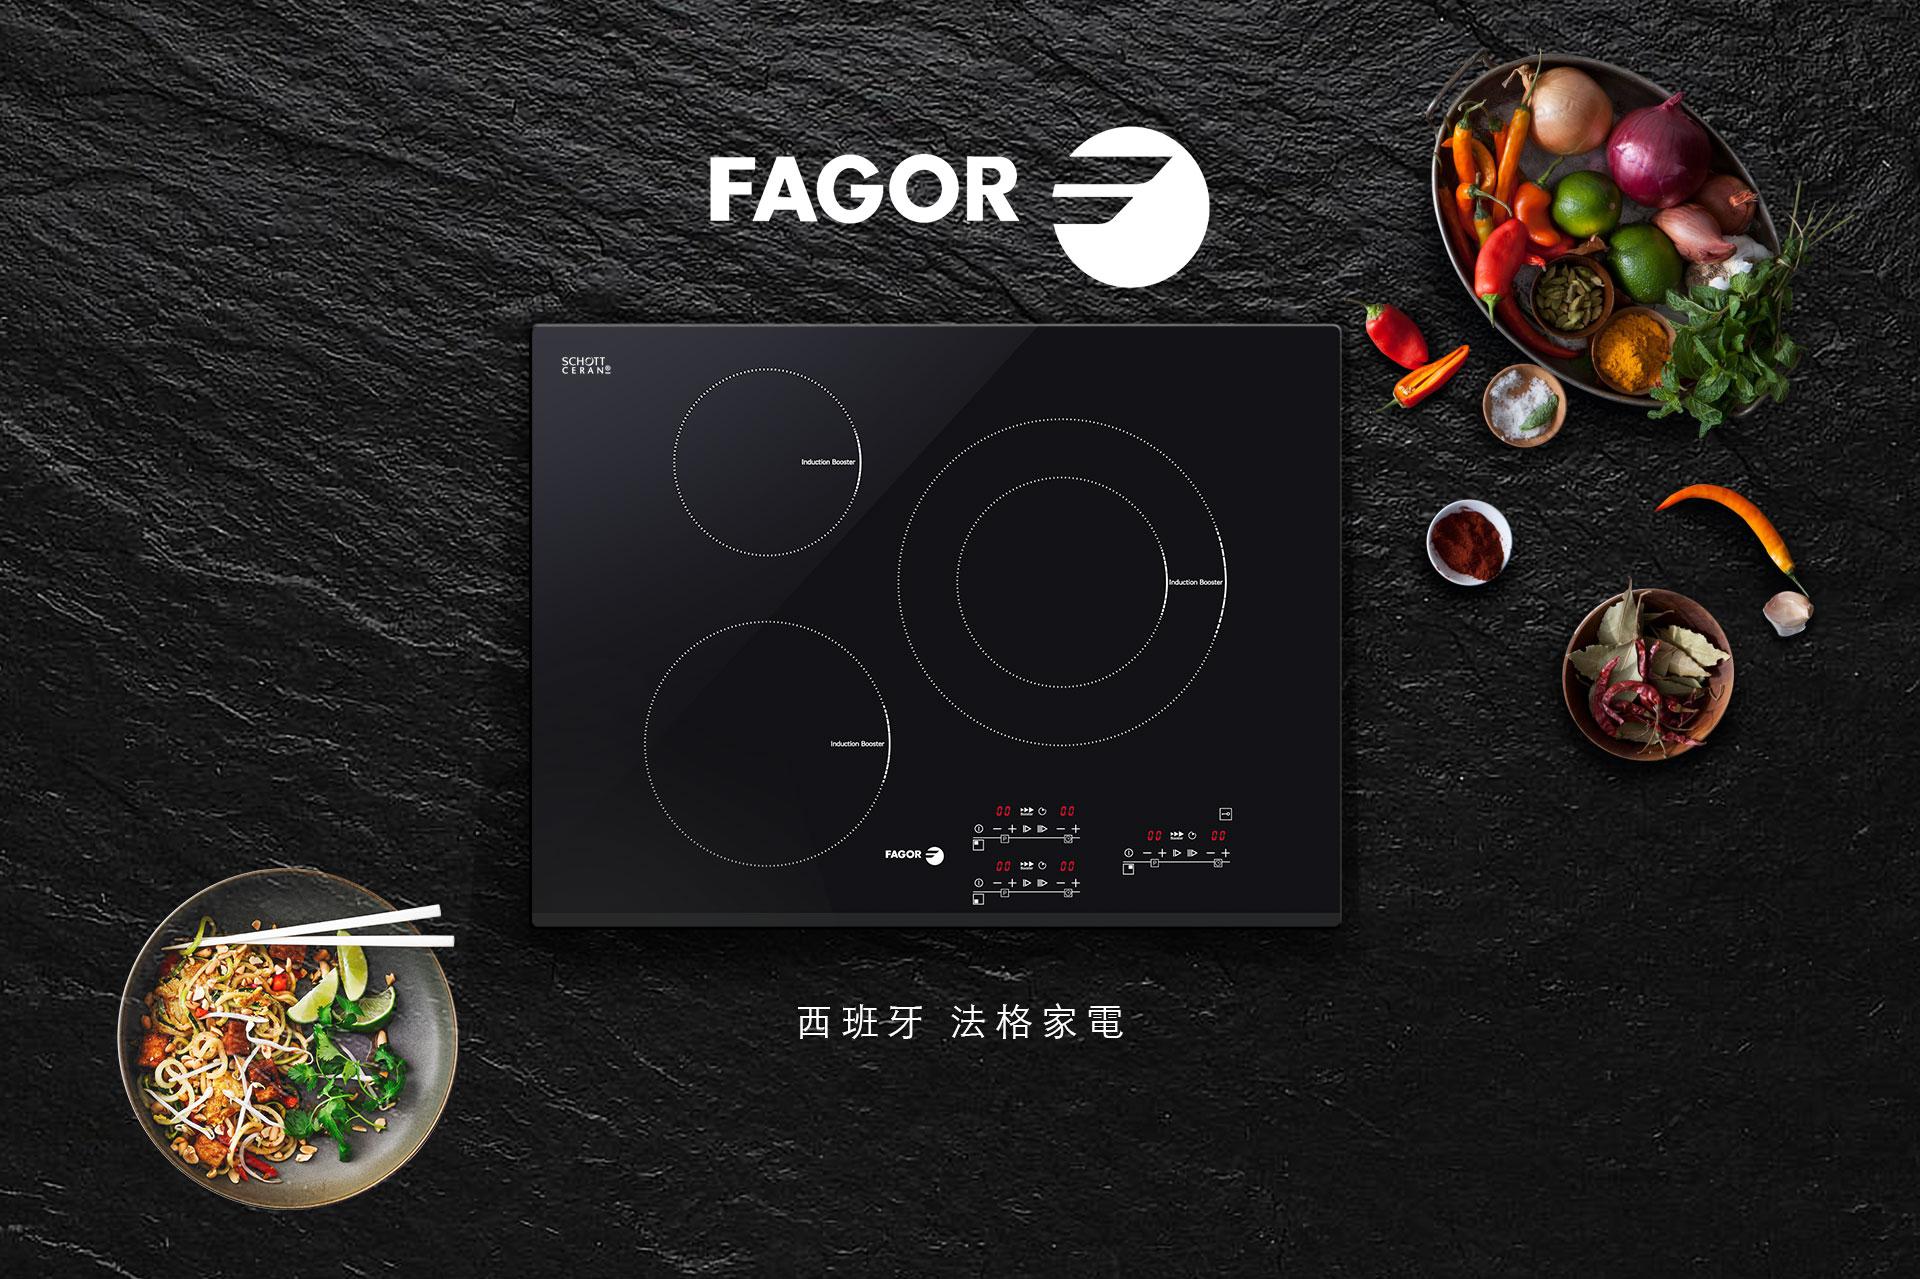 Fagor 三口感應爐